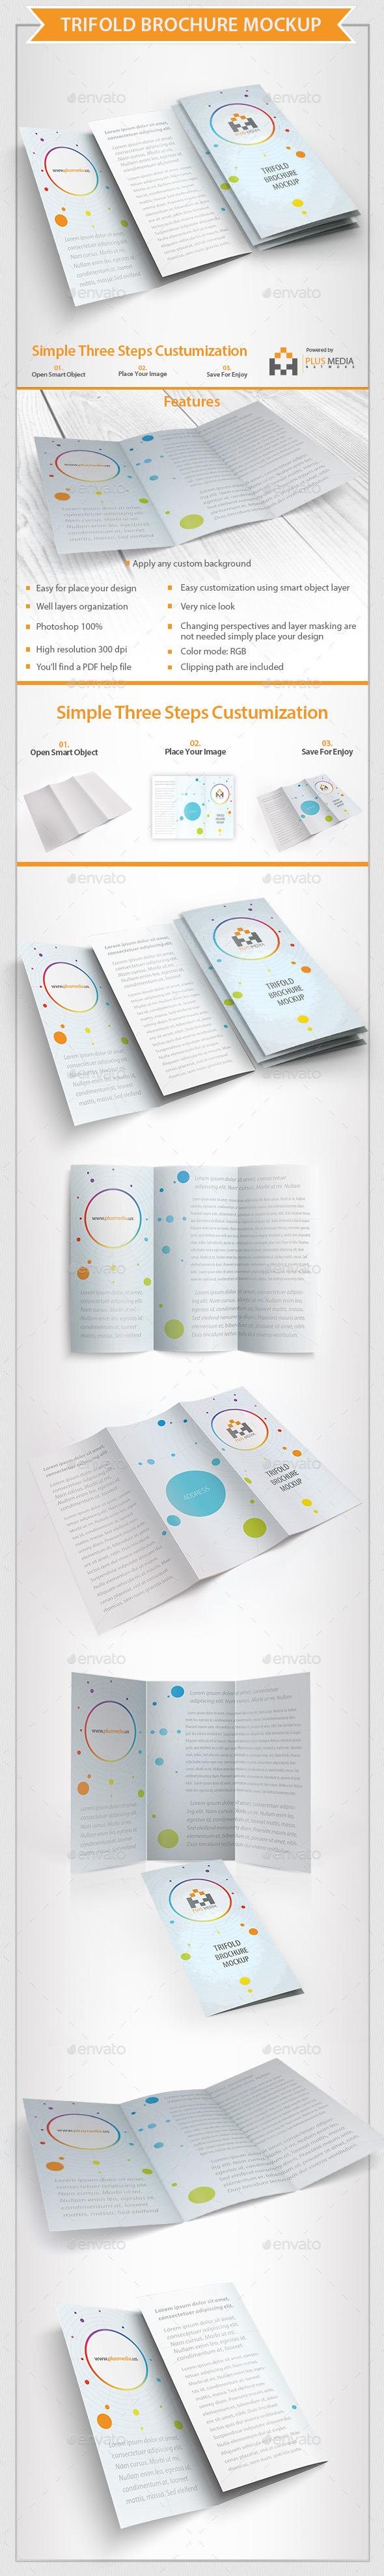 GraphicRiver Trifold Brochure Mockup 10366875